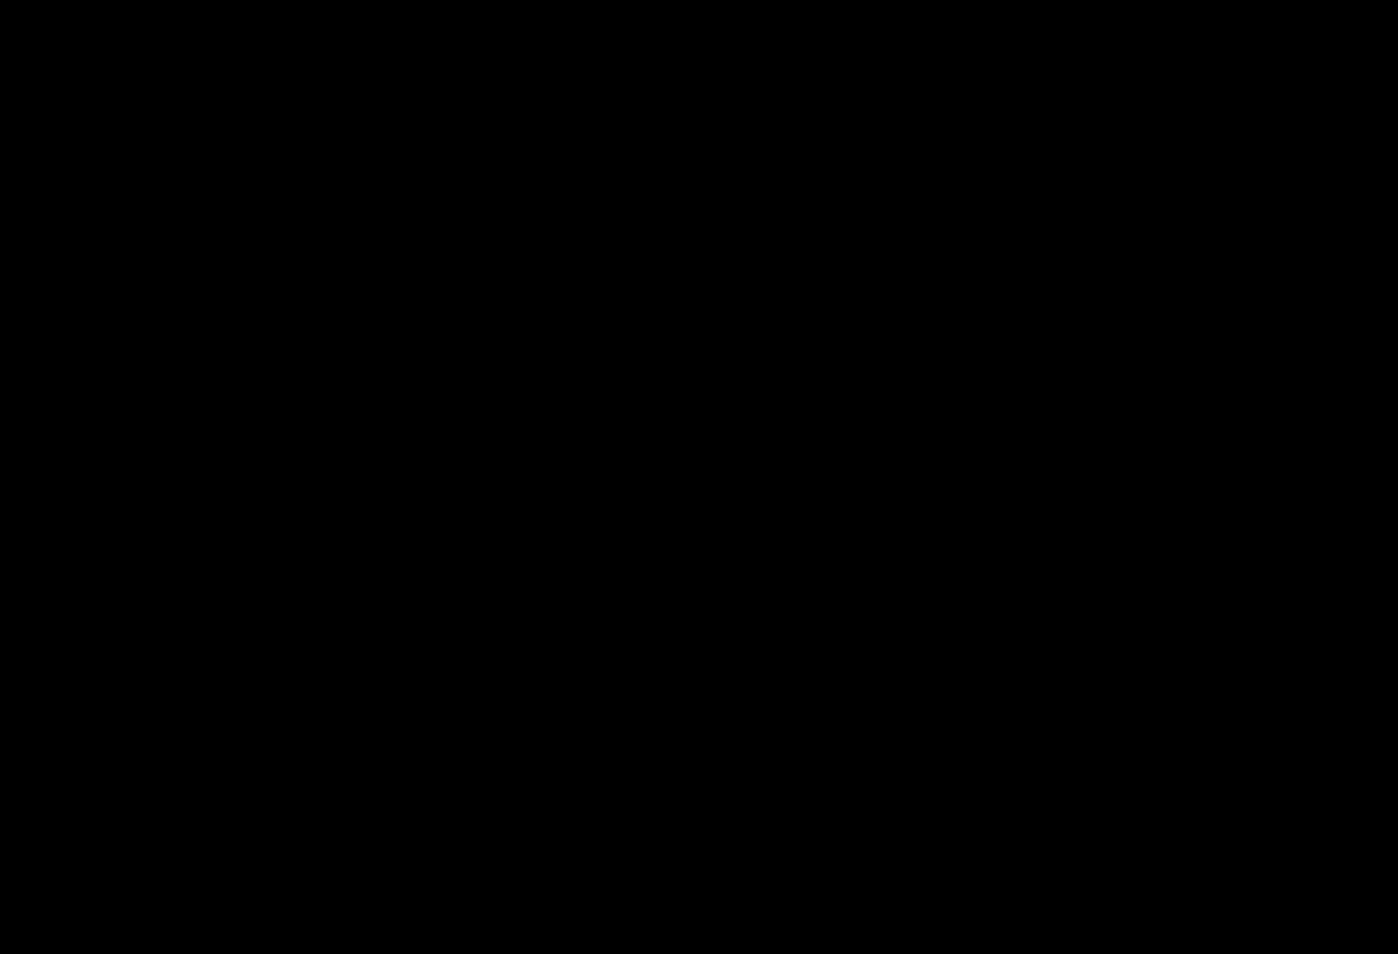 Download Hd Green Bay Packers Logo Png Green Bay Png Transparent Png Image Nicepng Com